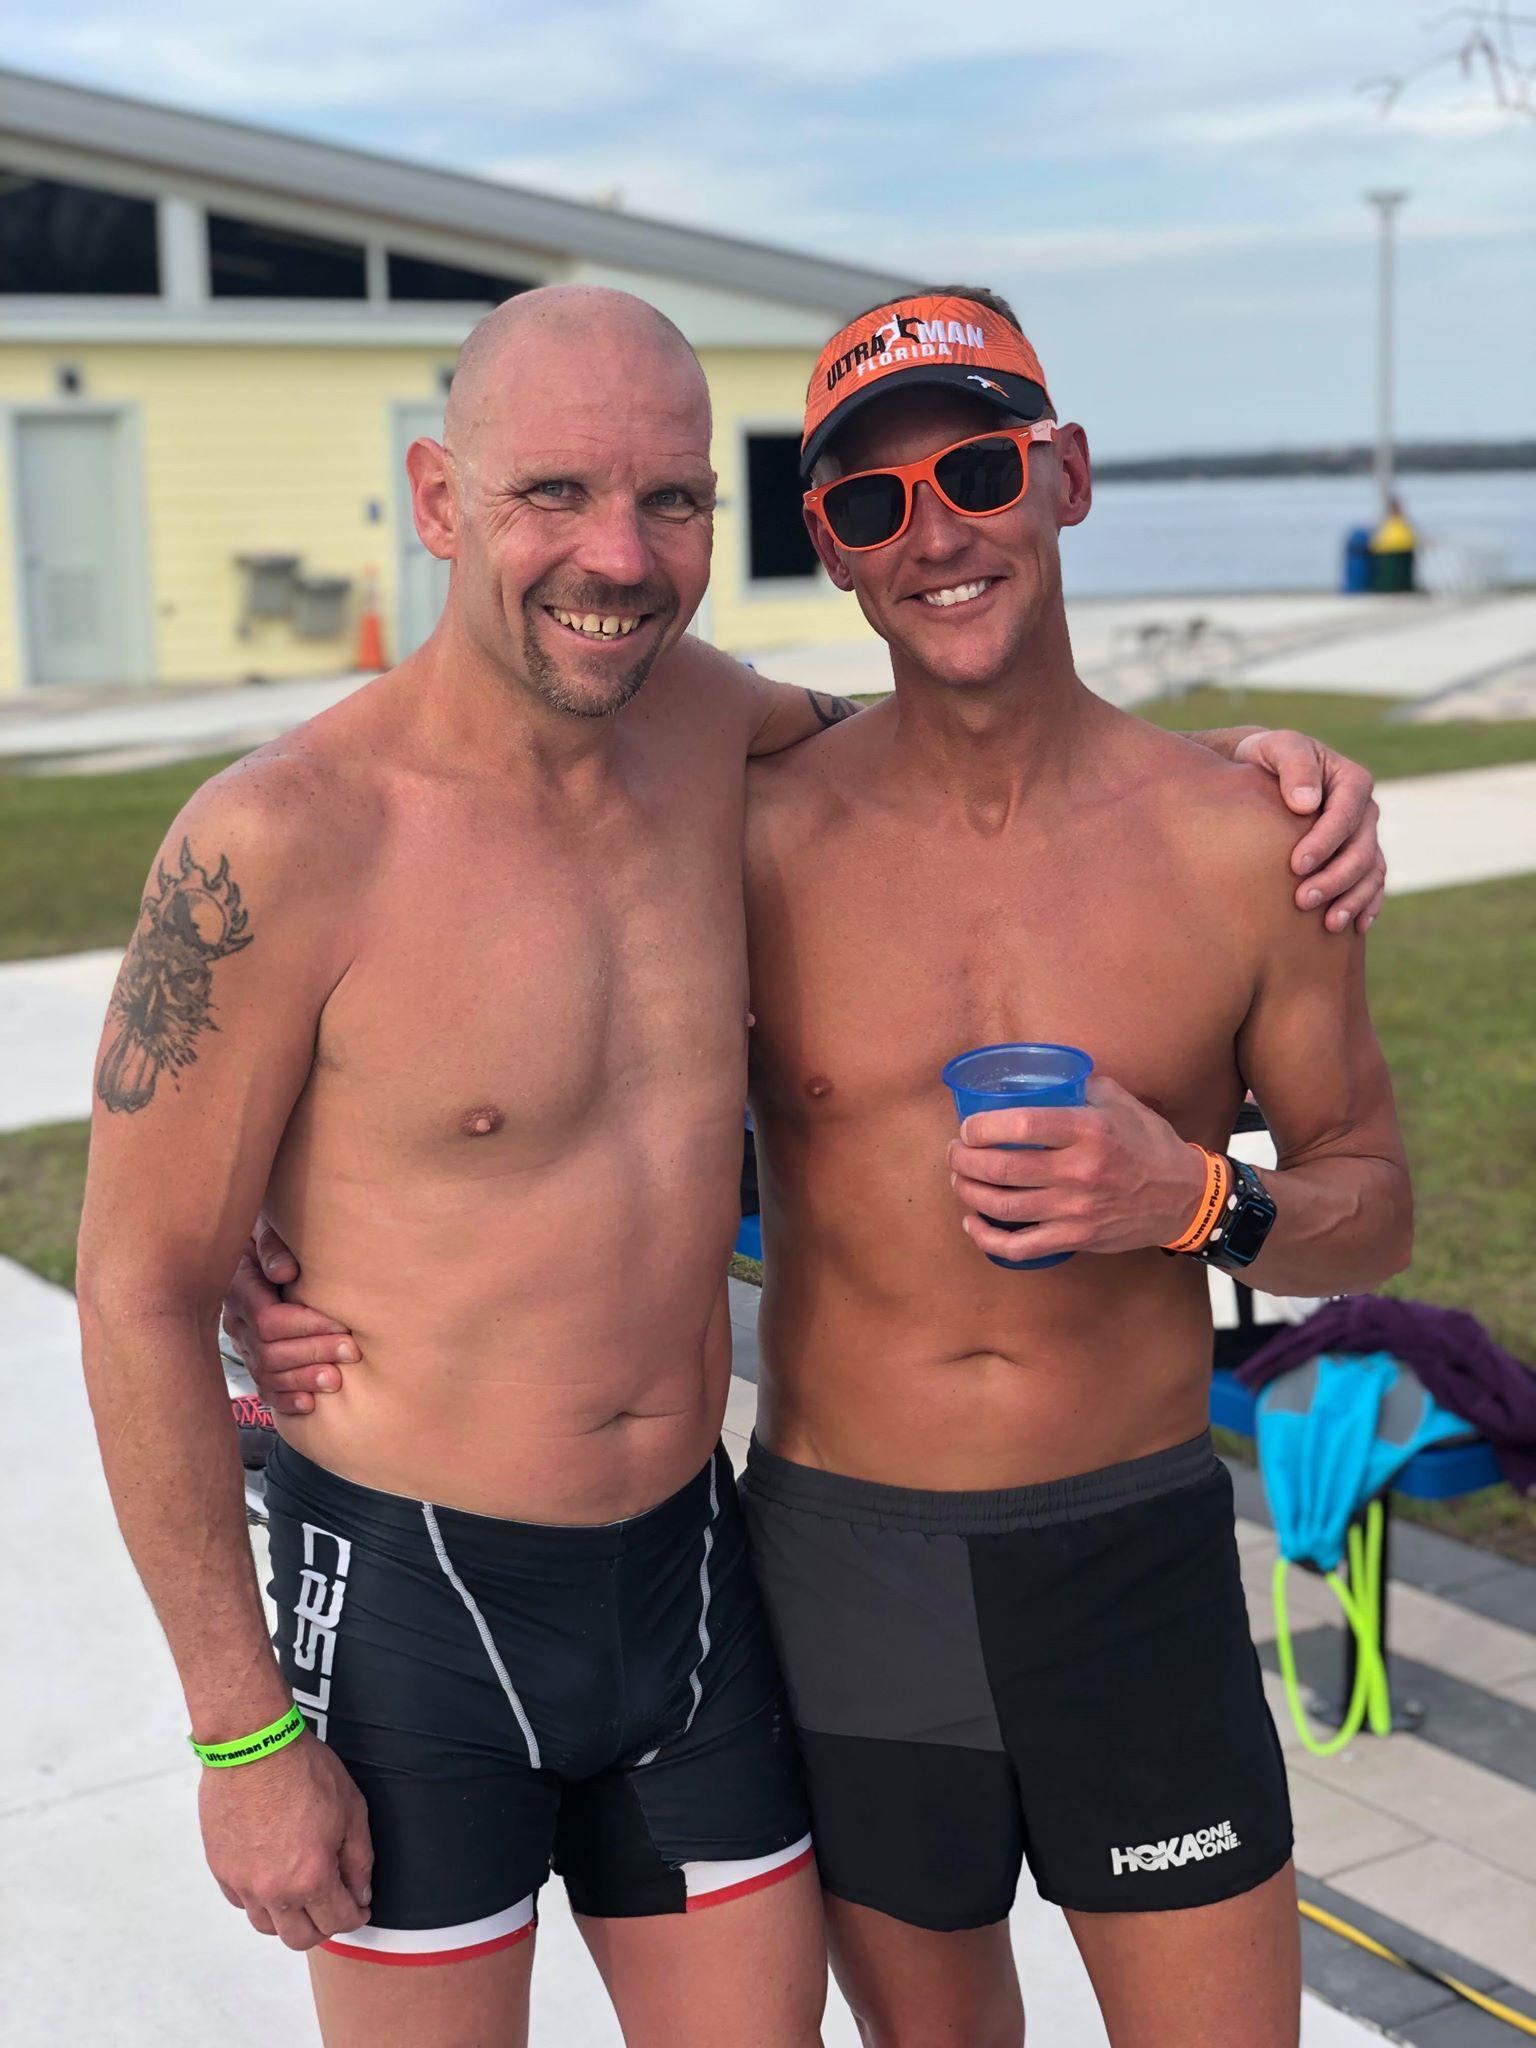 Coach_Terry_Wilson_Pursuit_of_The_Perfect_Race_Ultraman_Florida_Chris_Pollack_18.jpg